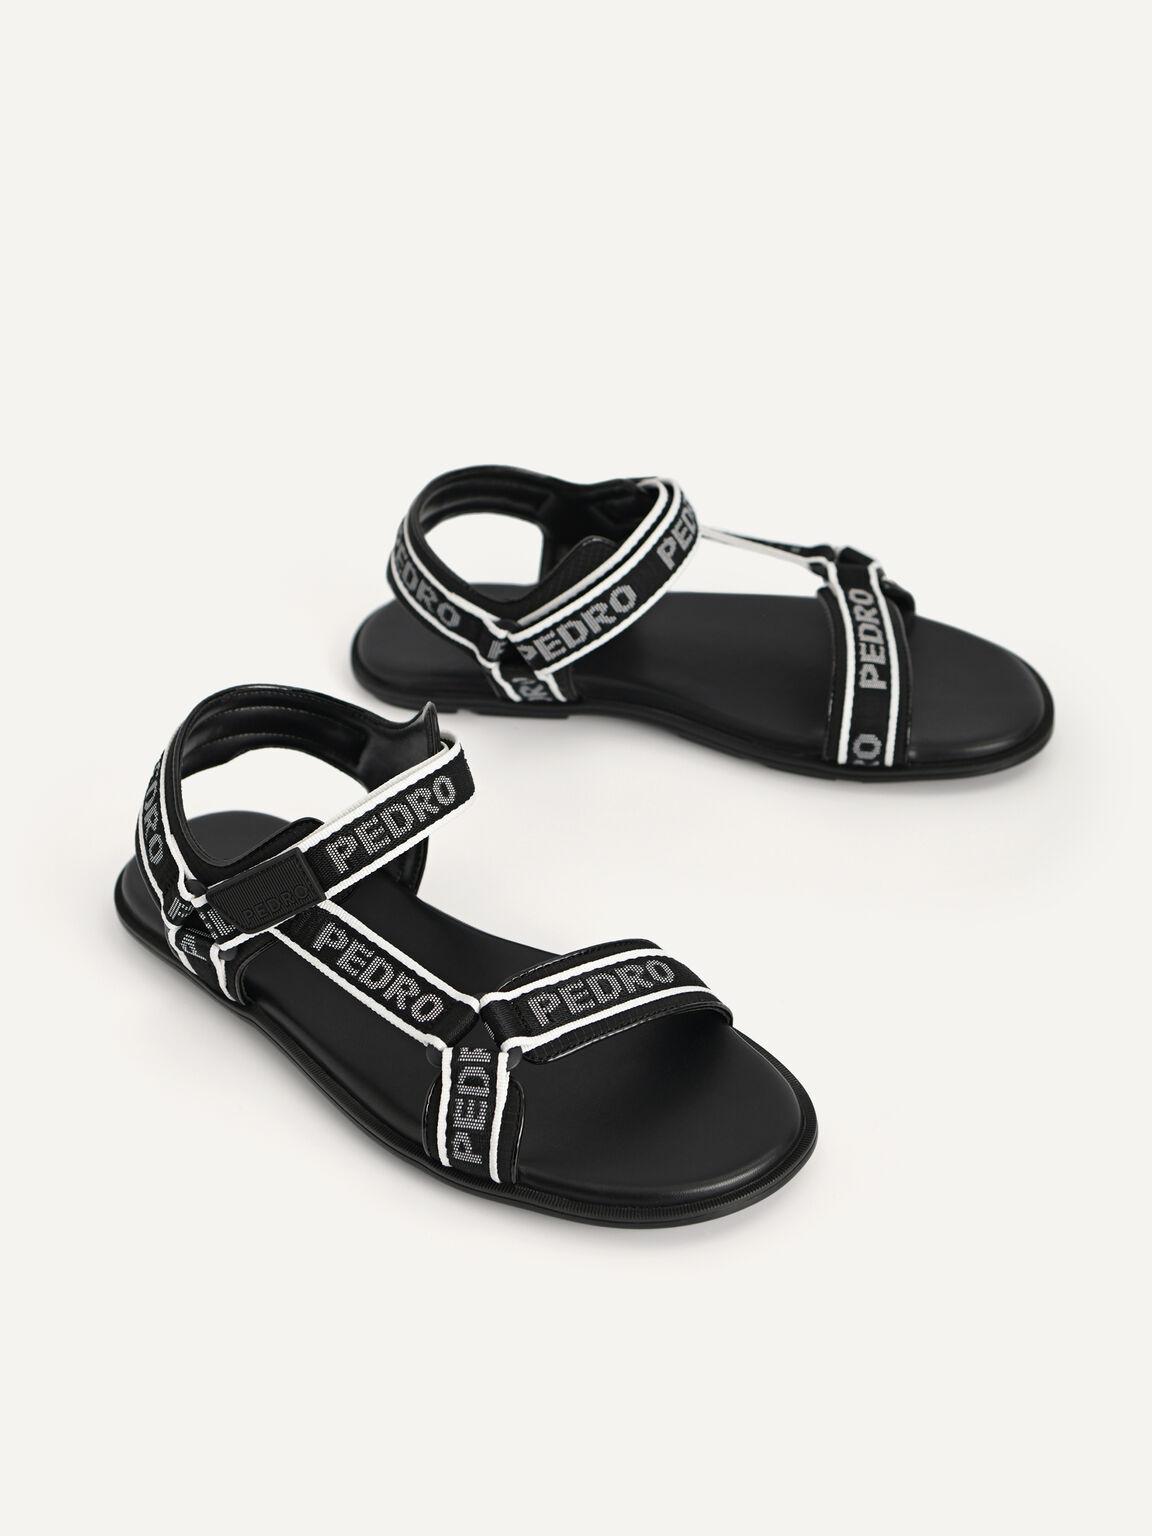 Nylon Velcro Sandals, Black, hi-res